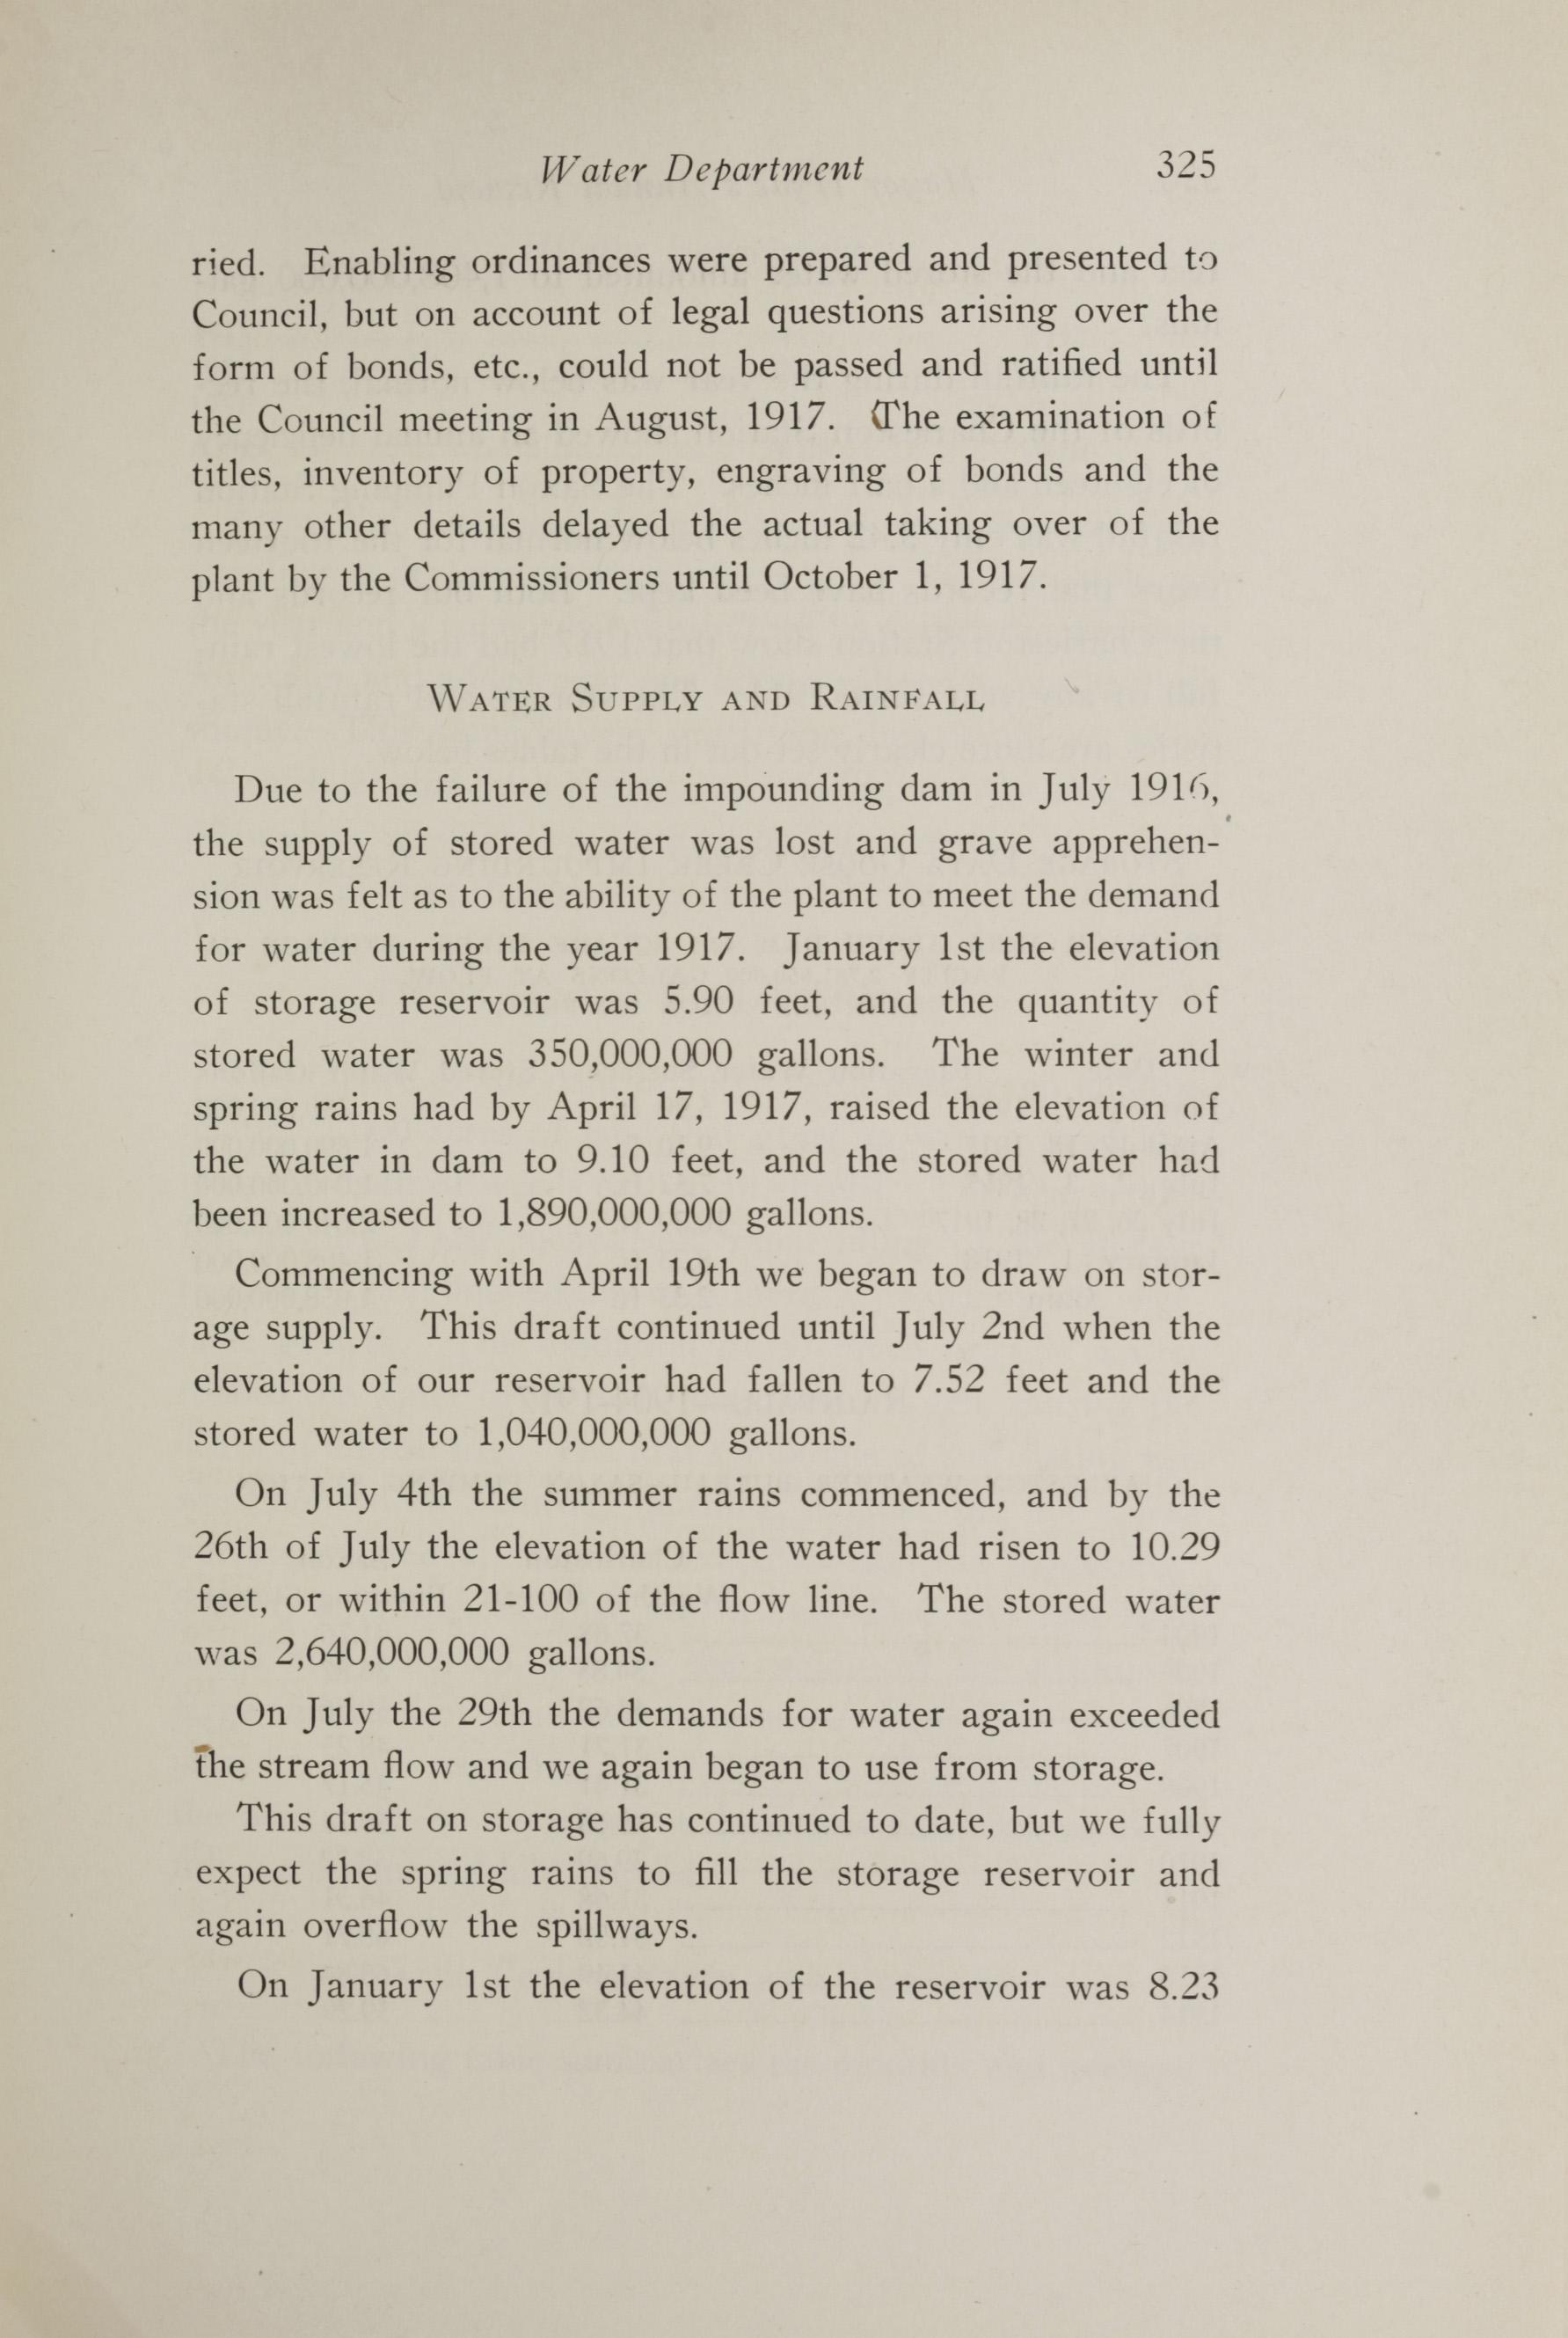 Charleston Yearbook, 1917, page 325